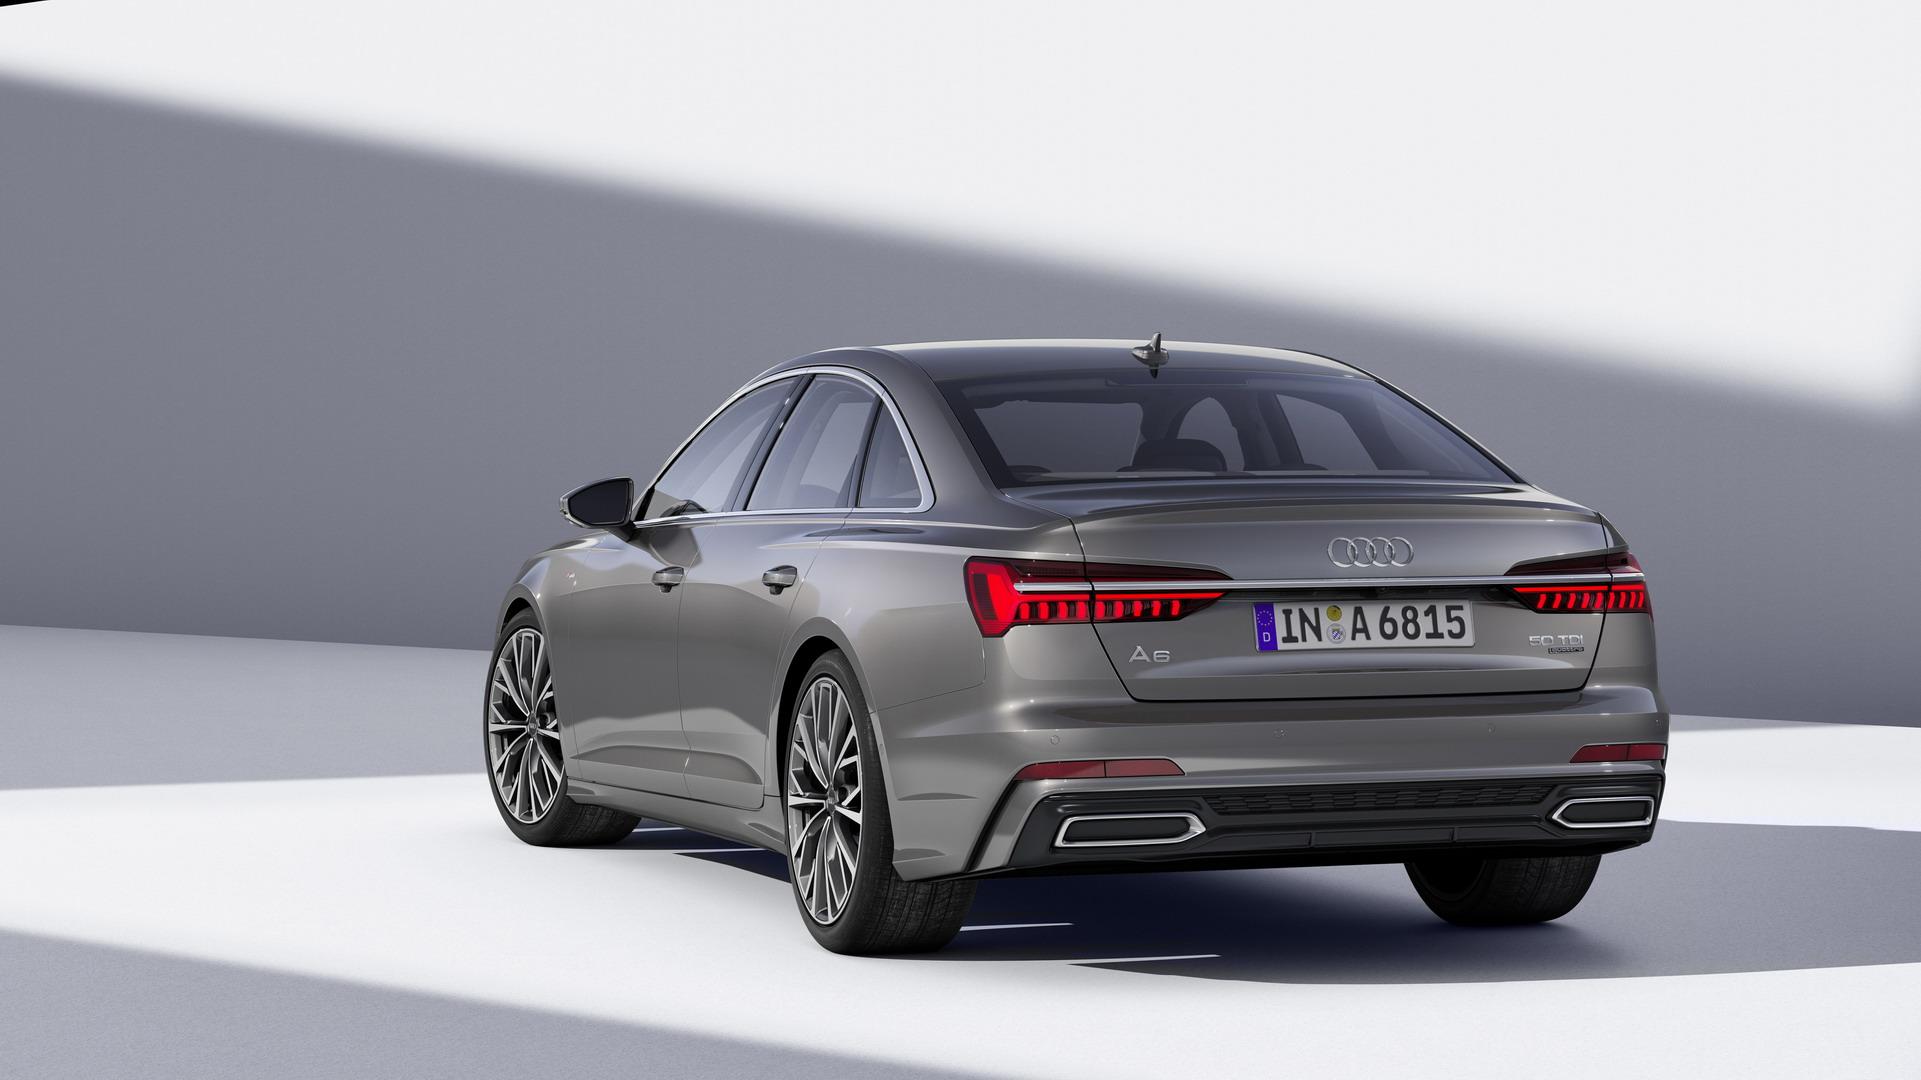 Audi A6 2018 (15)